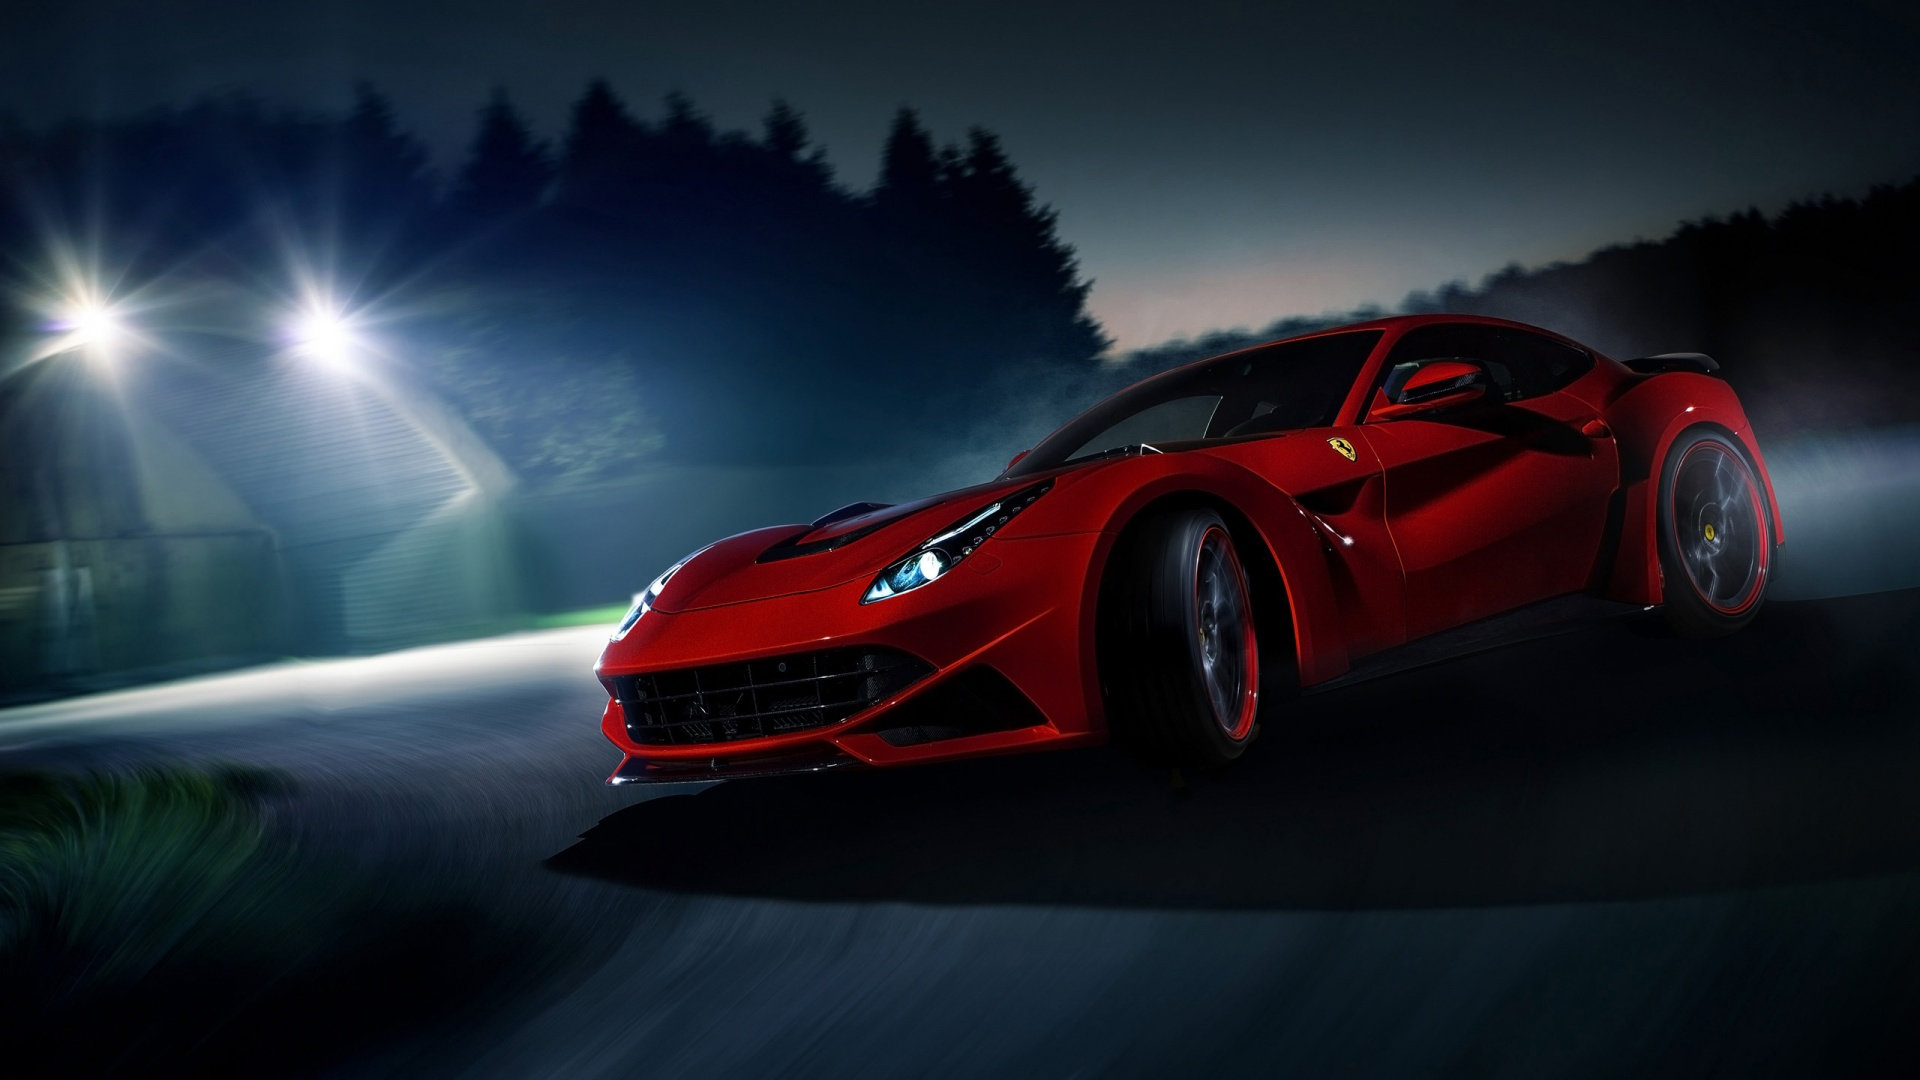 Ferrari Car Wallpaper For Desktop Tablet Wallpaper Car Pixelstalk Net